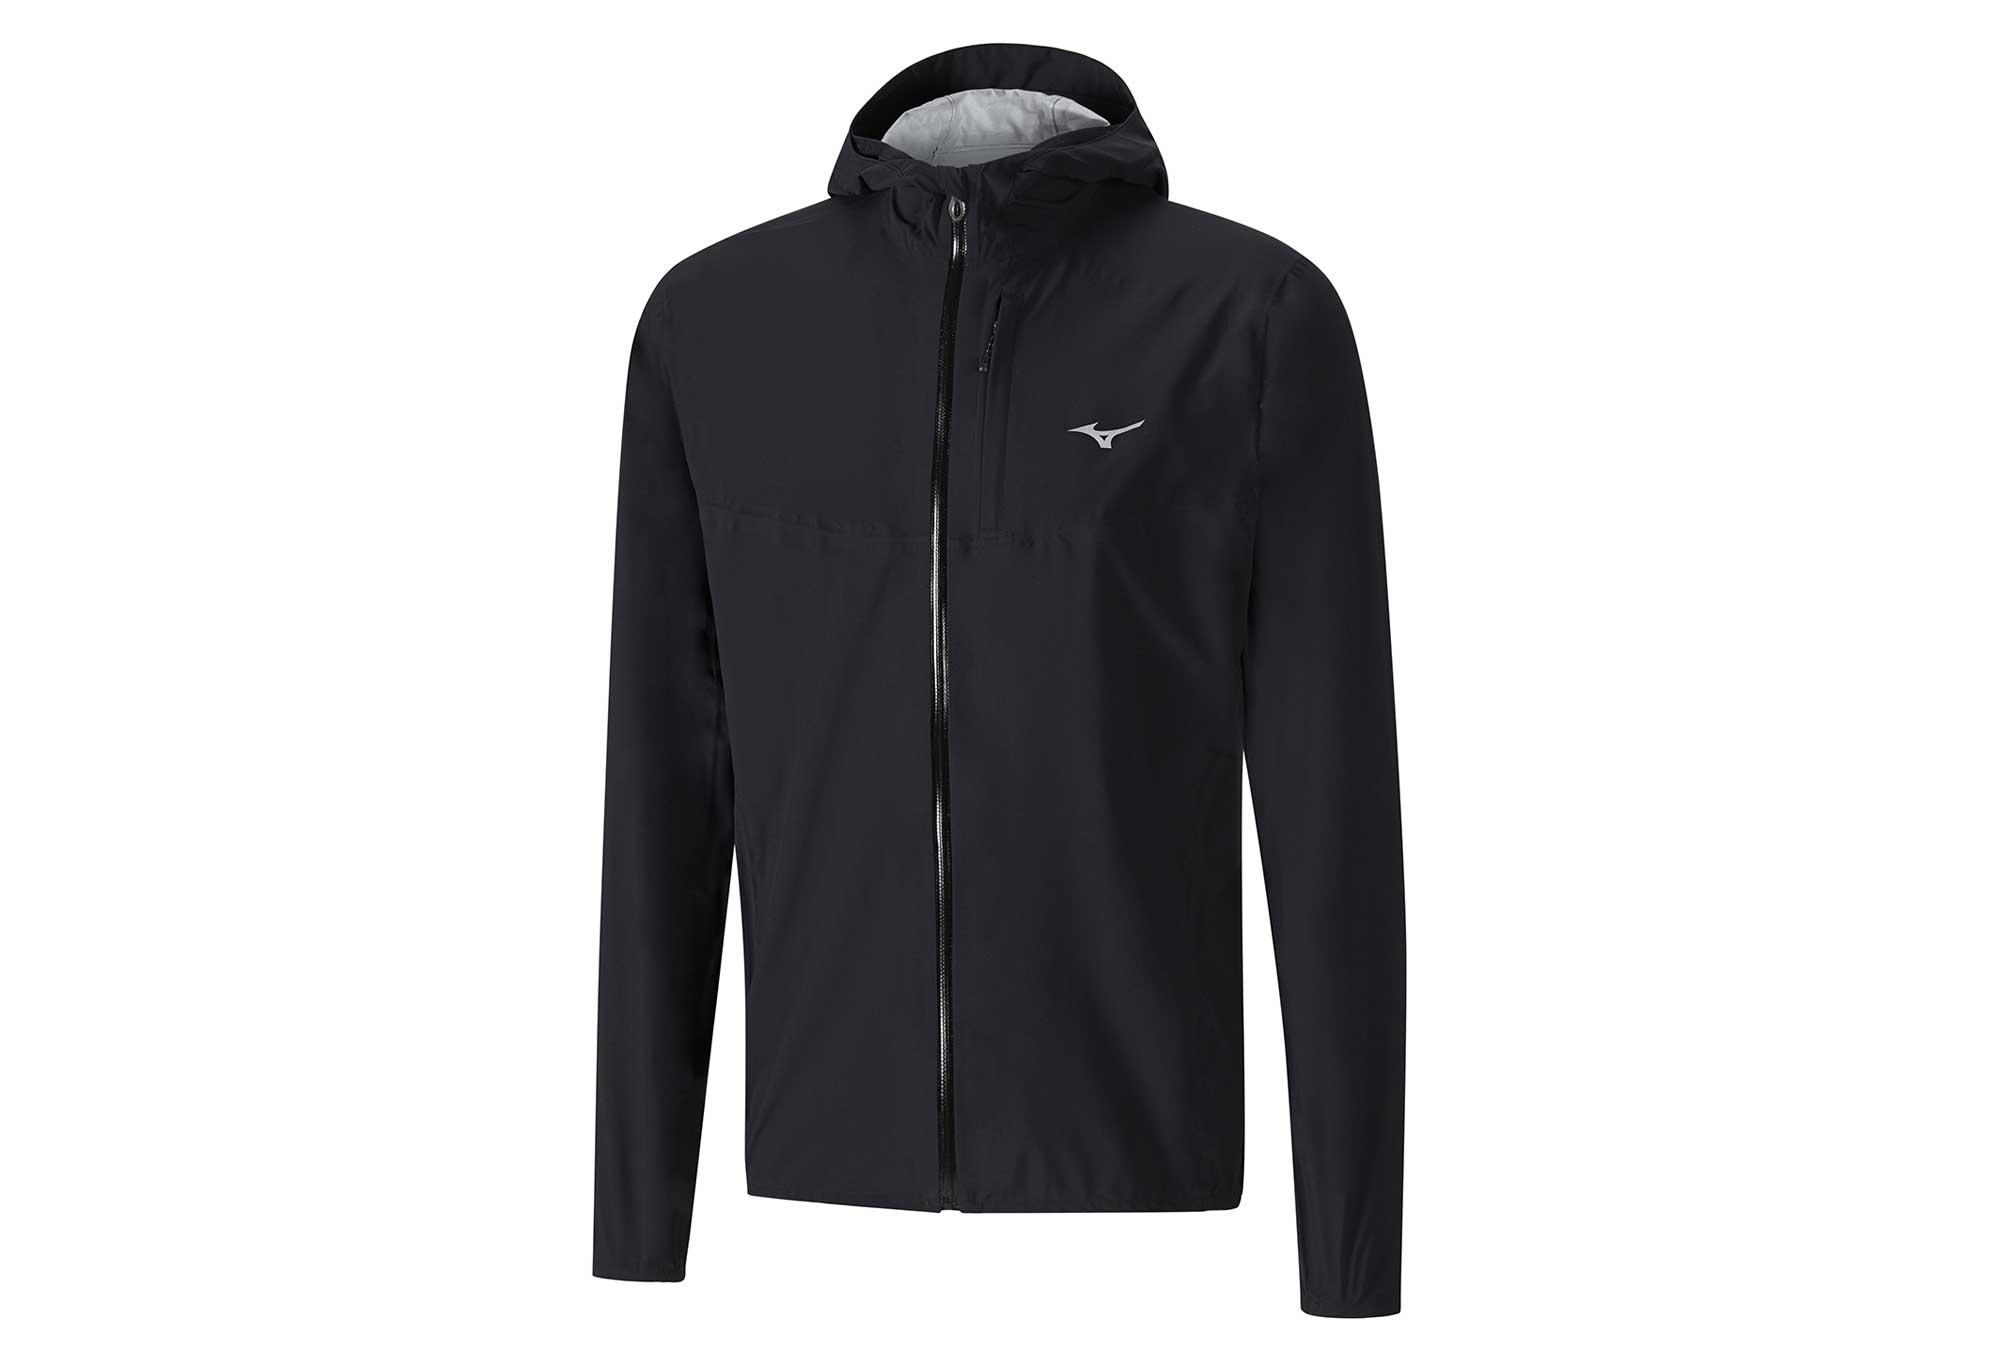 Mizuno Endura 20k Waterproof Jacket Black